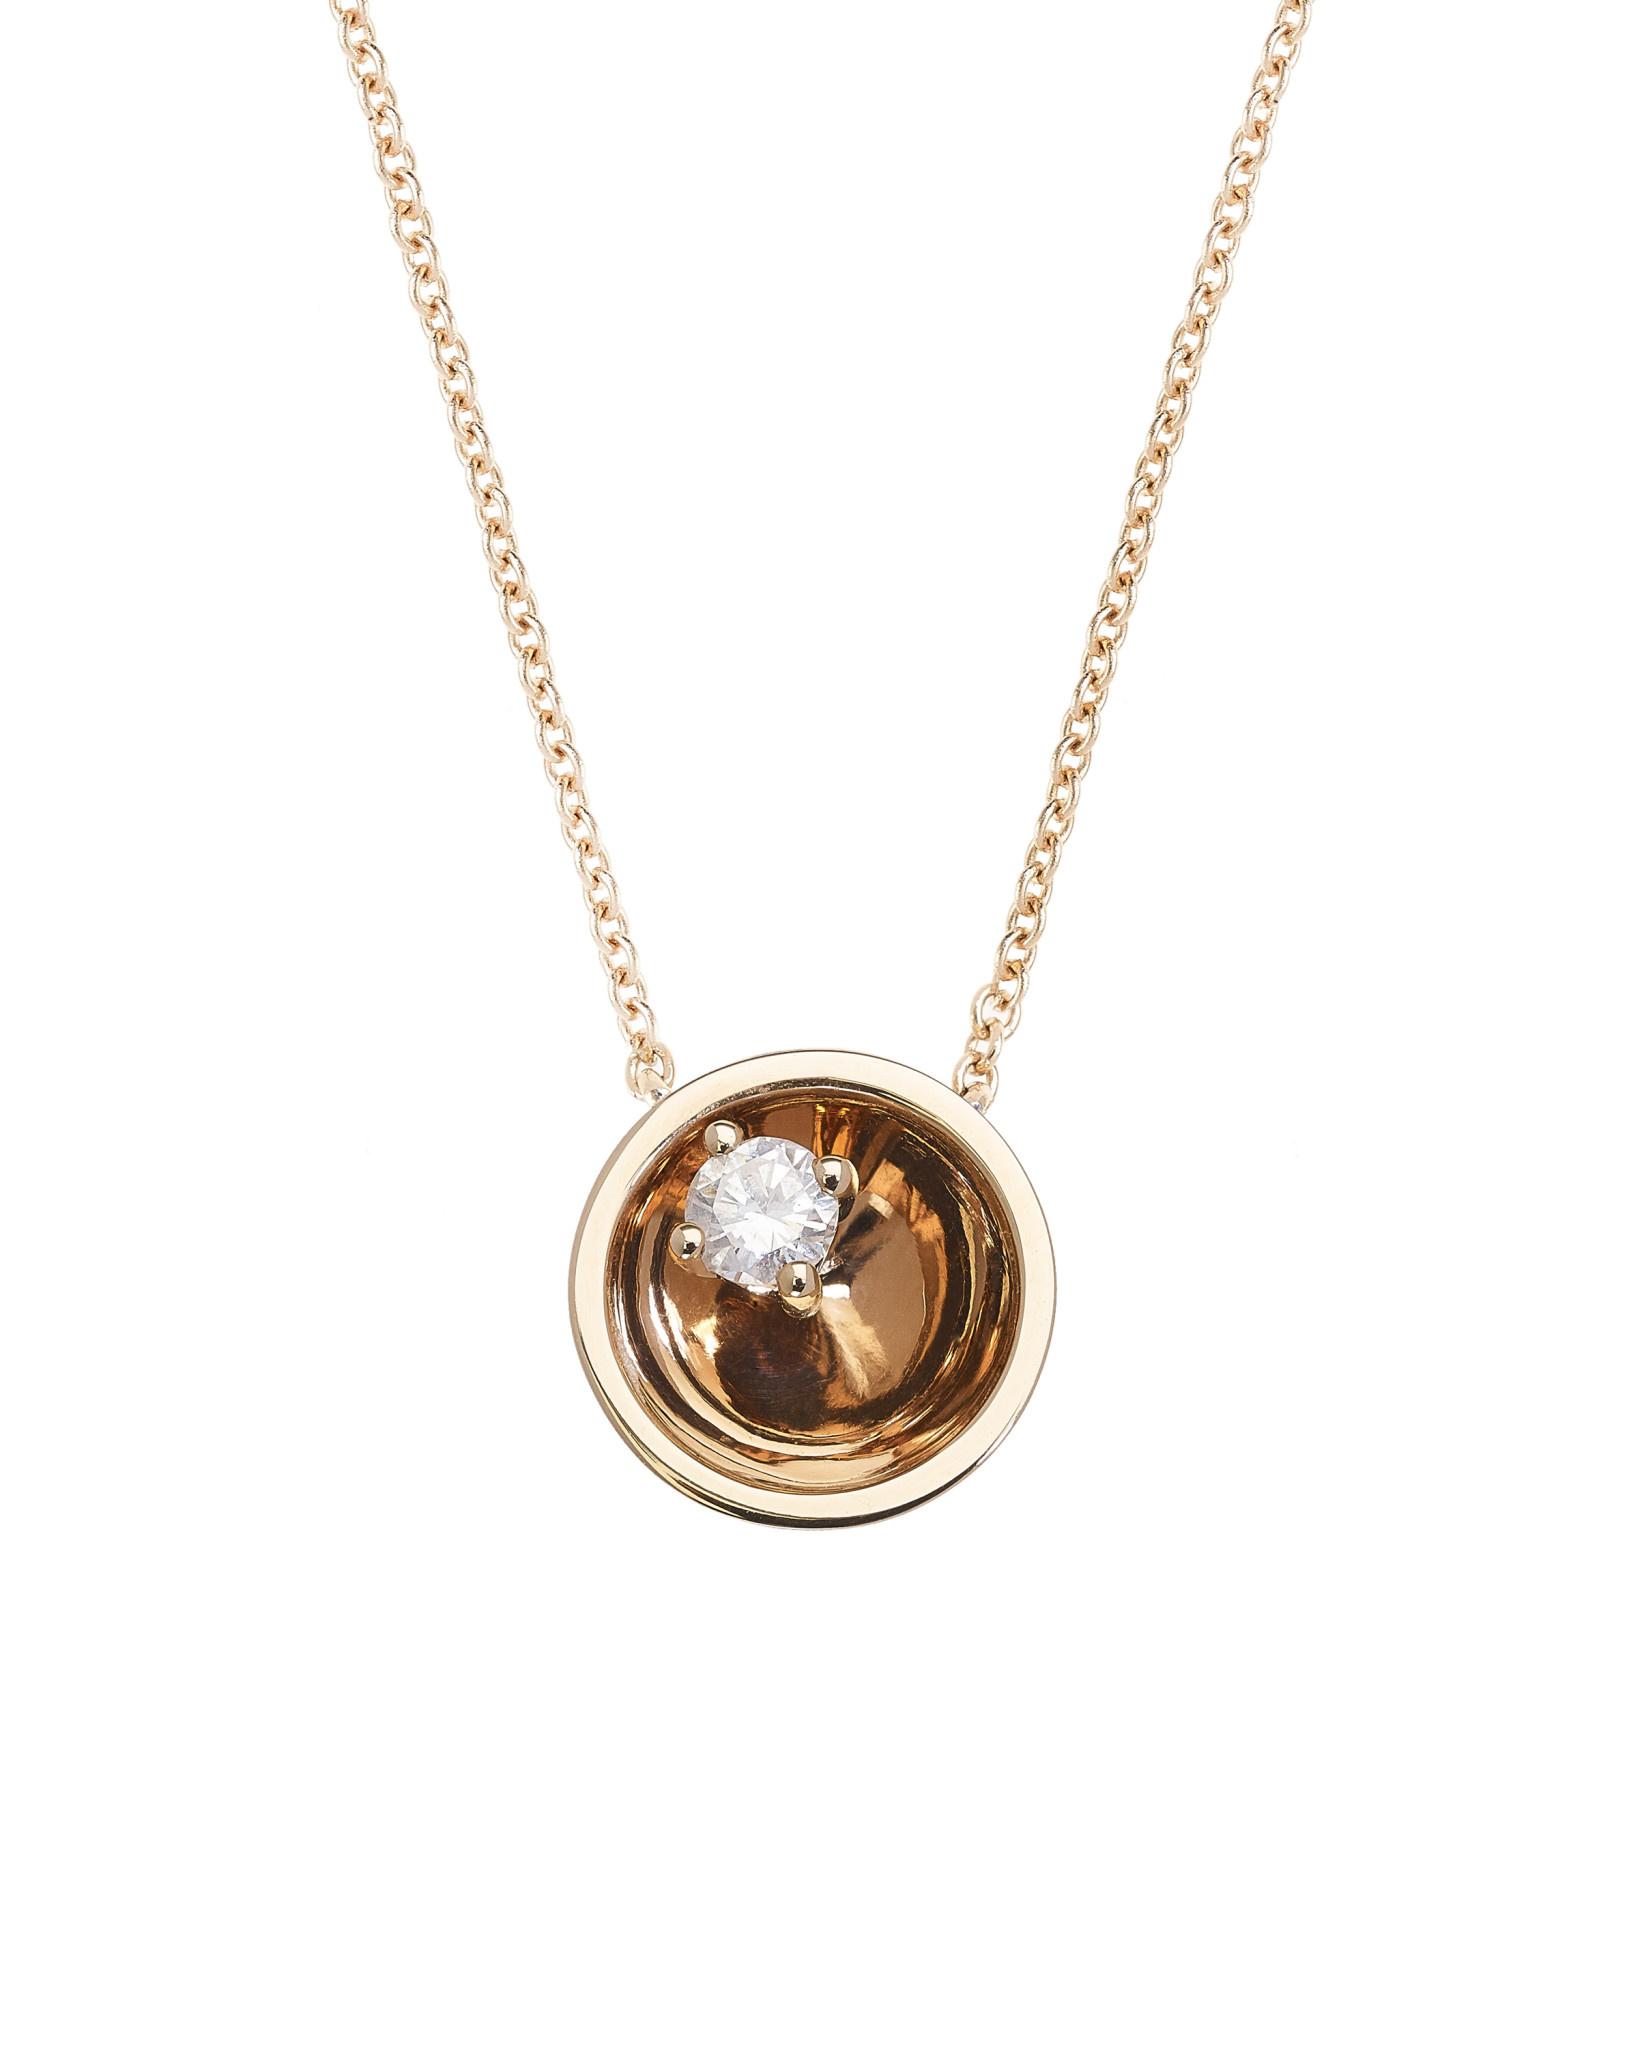 Large Diamond Floating Star Necklace 18K Gold